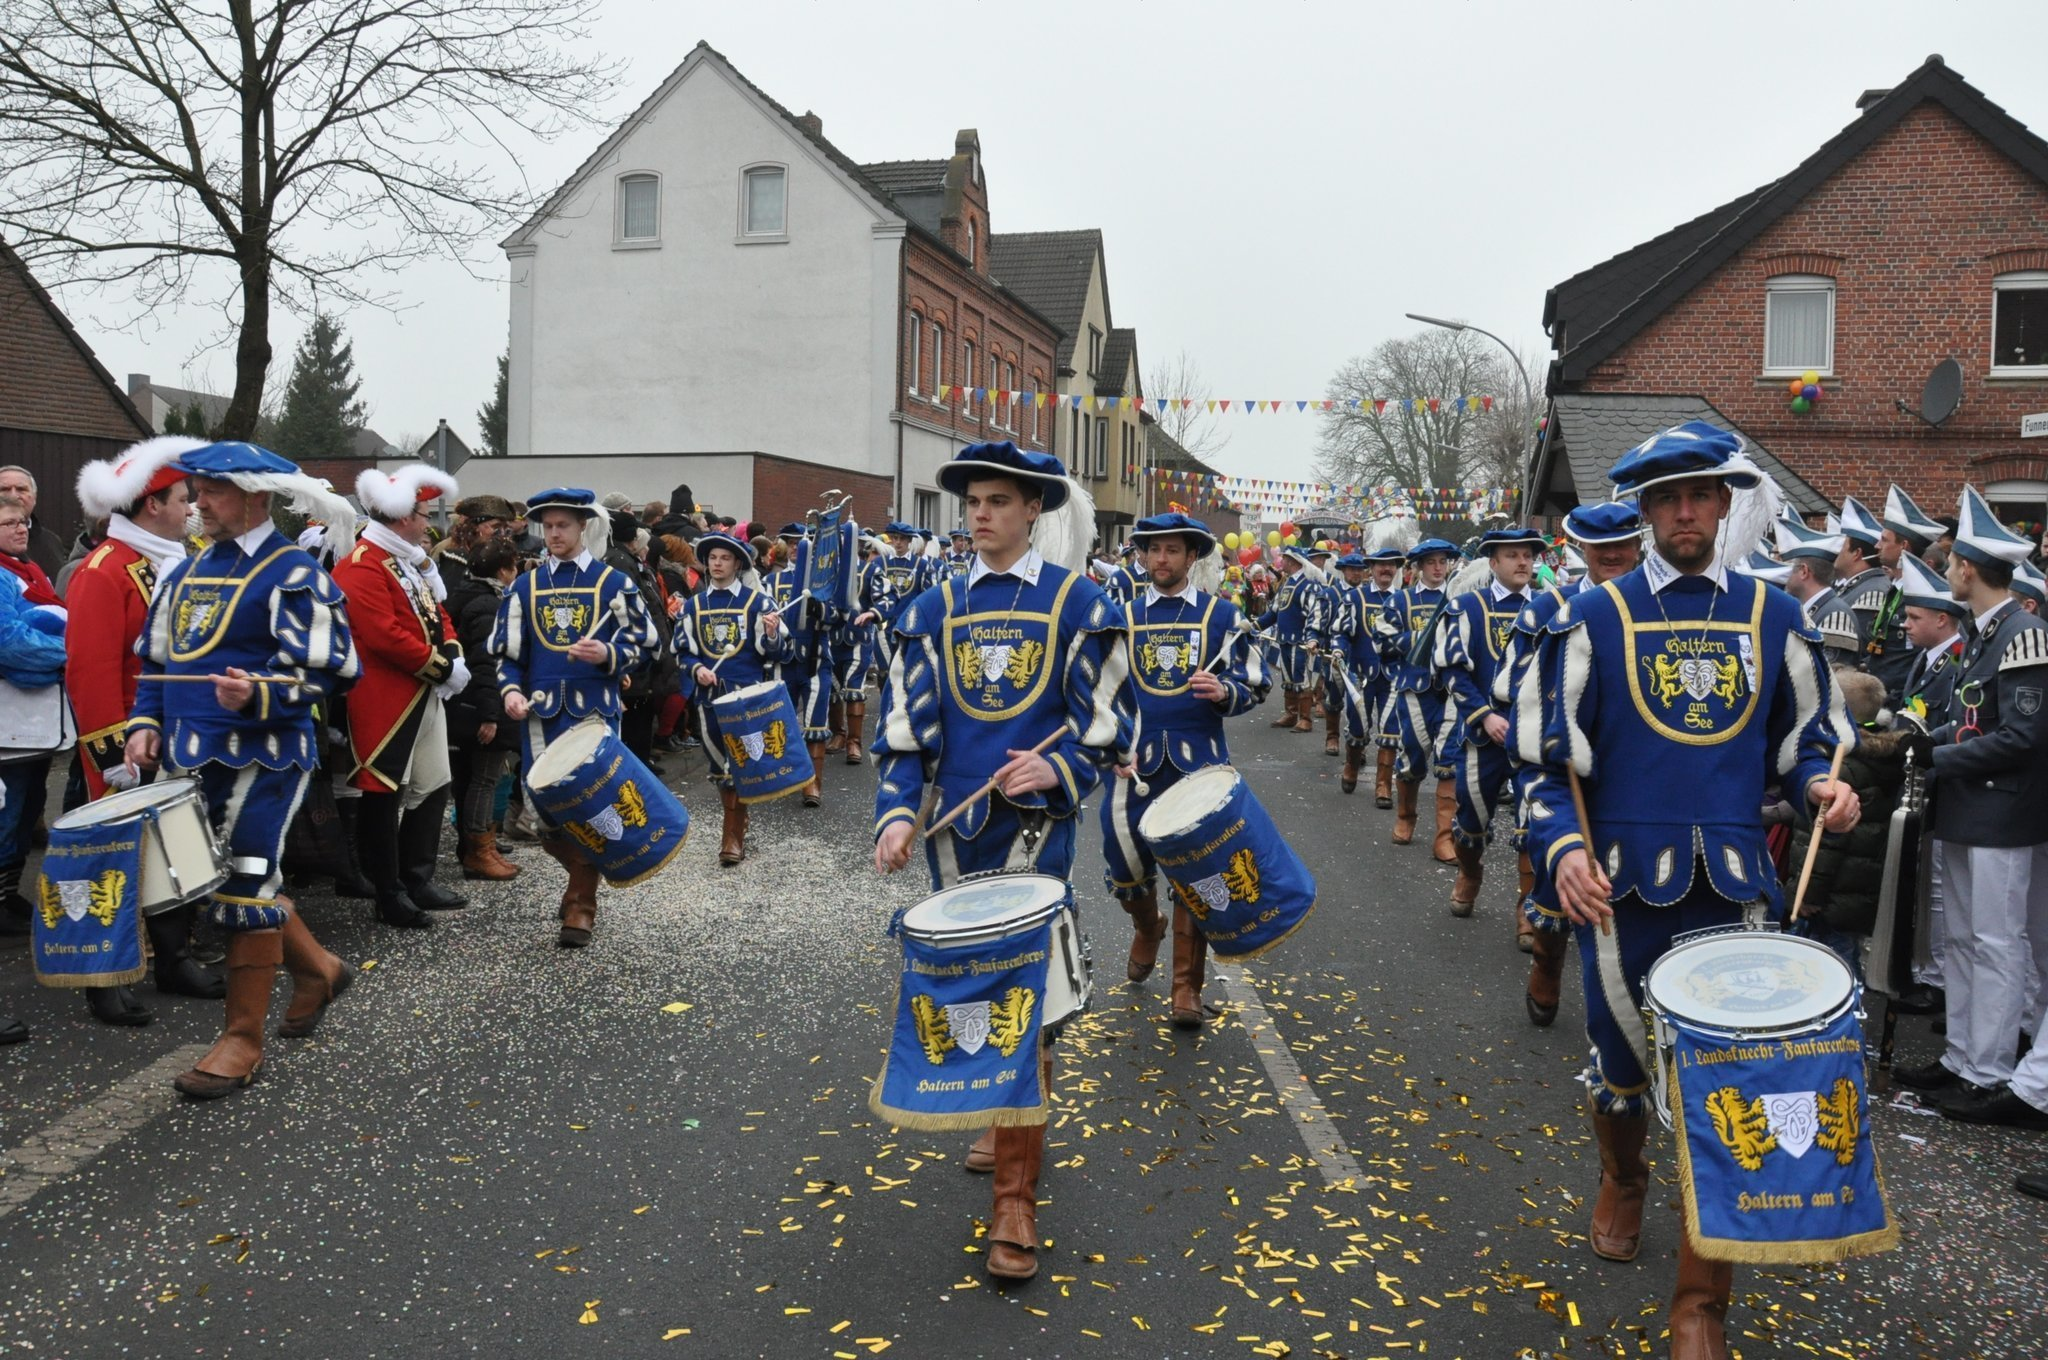 Olfen: Steverstadt startet in die Session - Proklamation am 10. November hat Familienfest-Charakter - Olfen - Lokalkompass.de